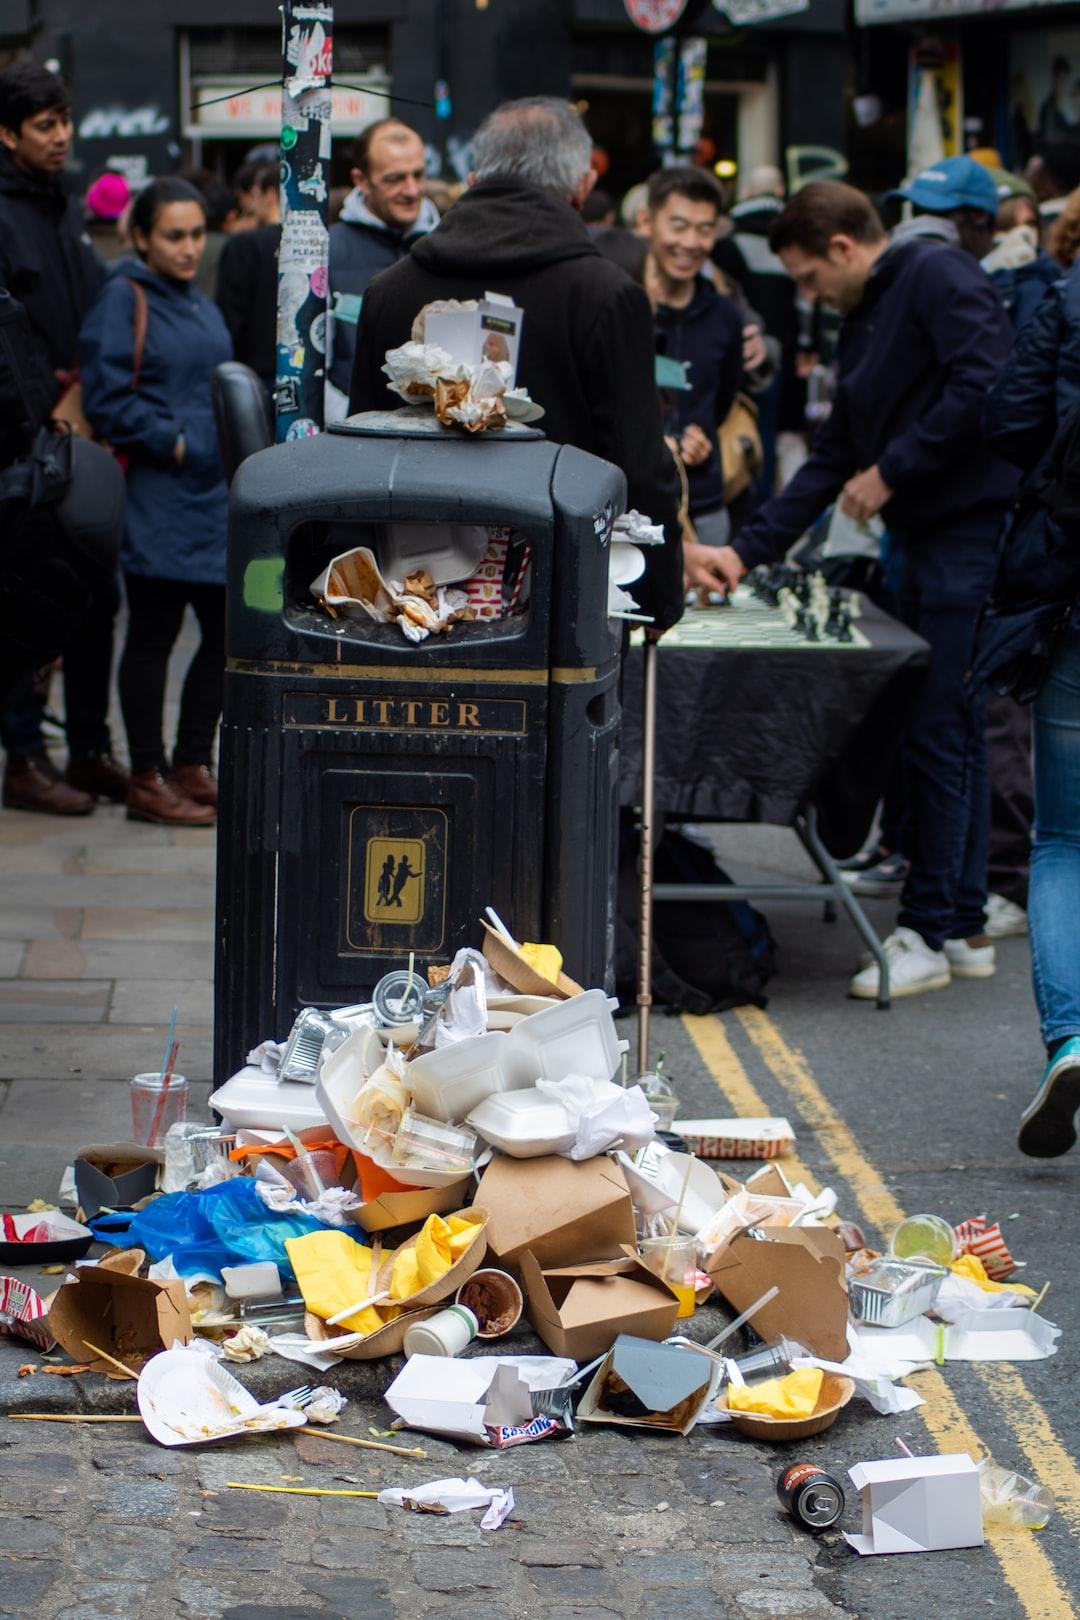 Foodmarket litter trash crowded